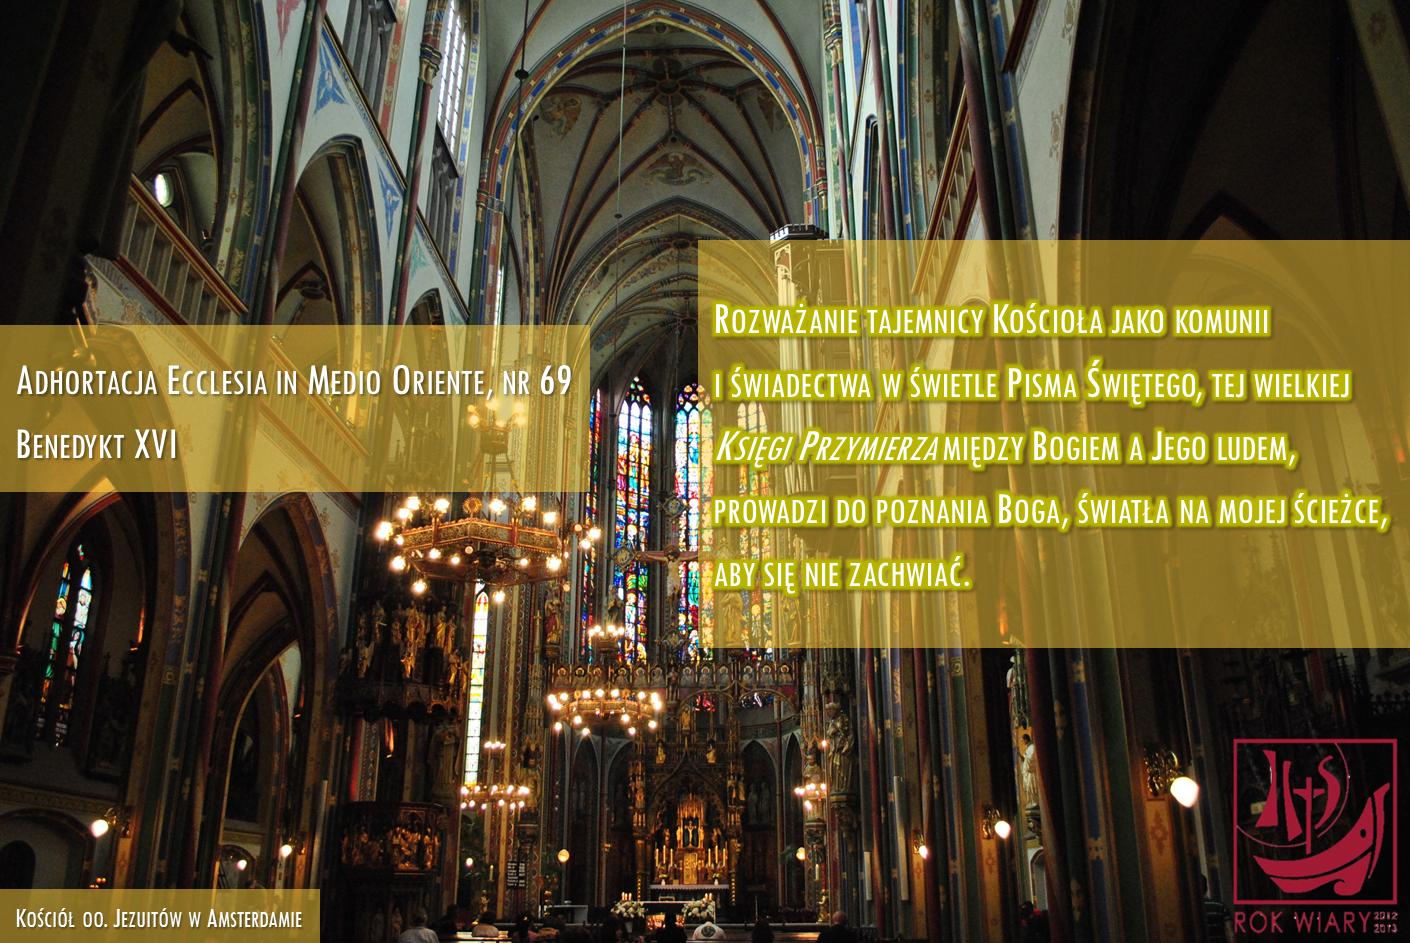 Benedykt XVI - Ecclesia in Medio Oriente, 69